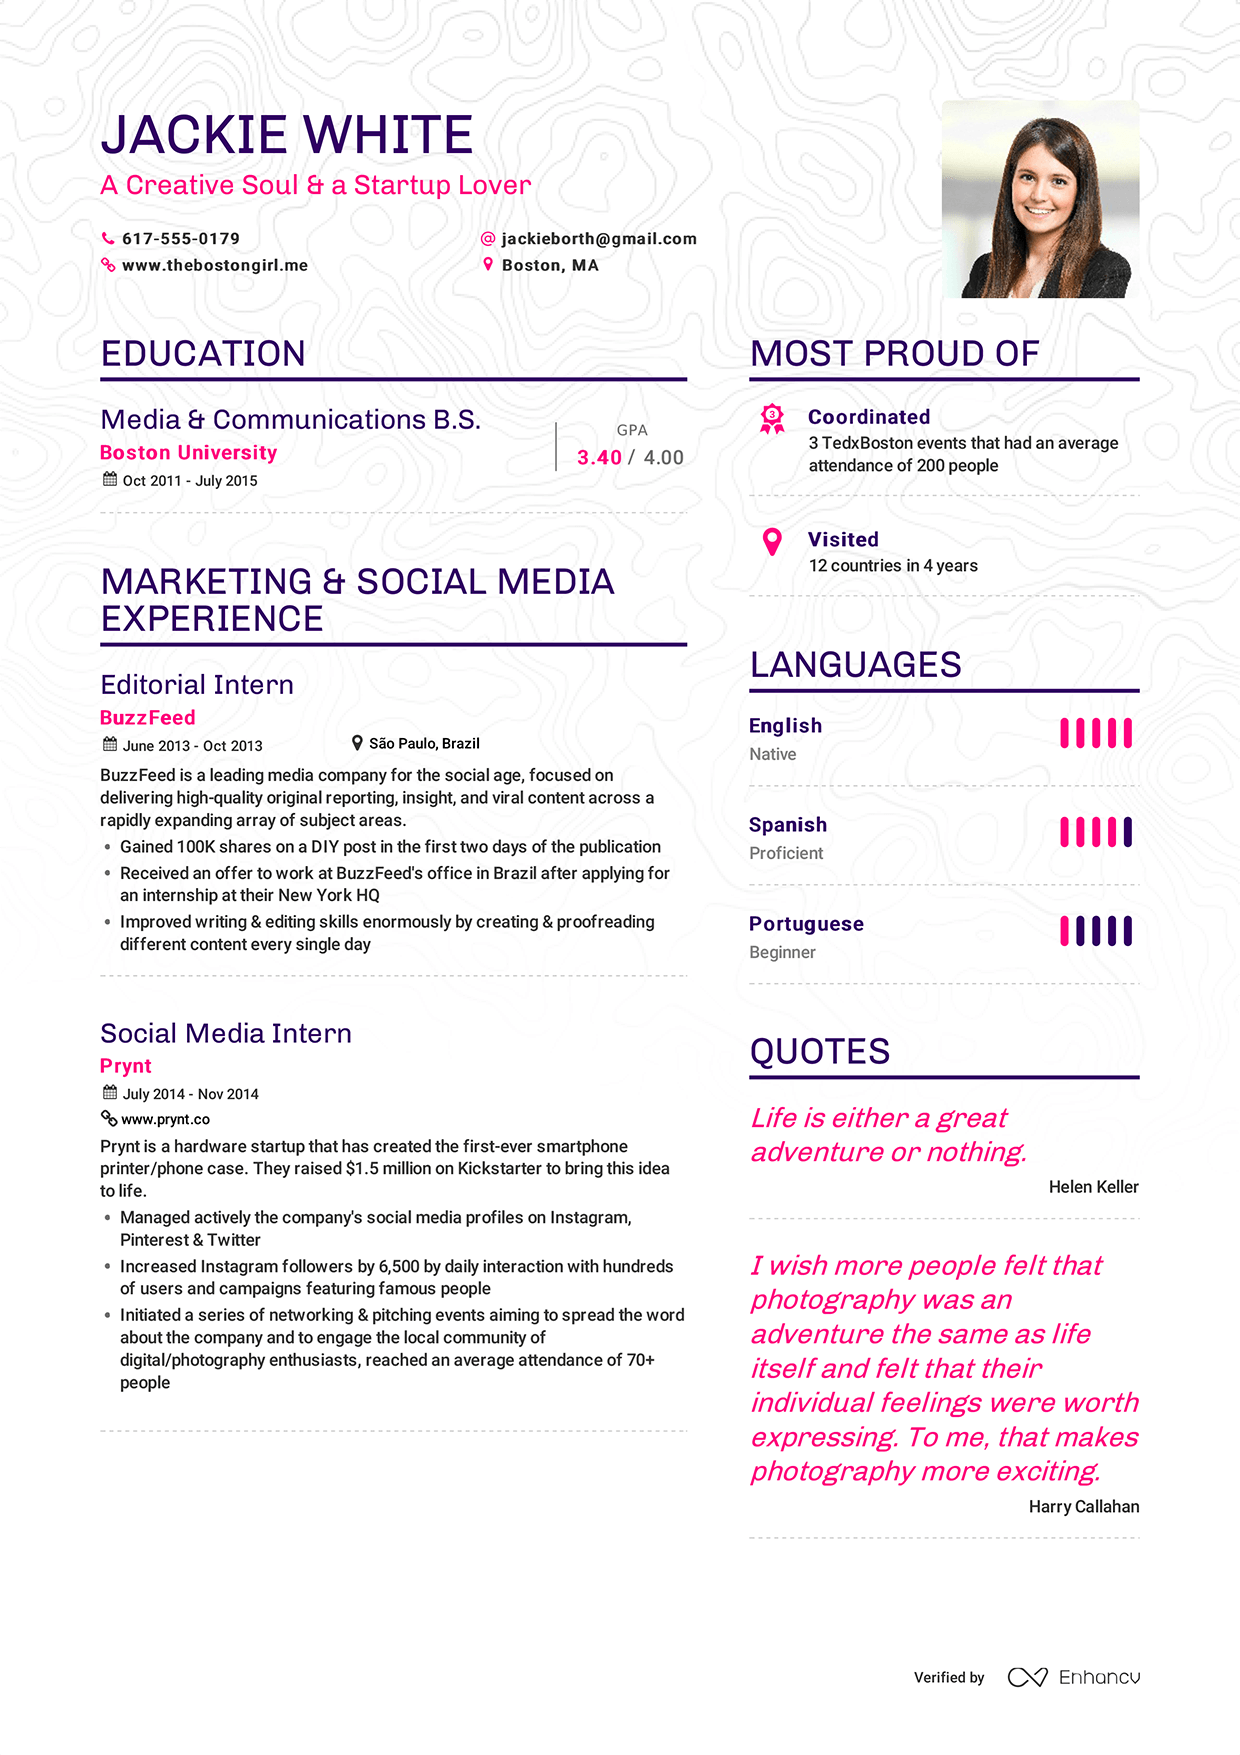 Enhance CV Beautiful Resumes UX Design Pinterest